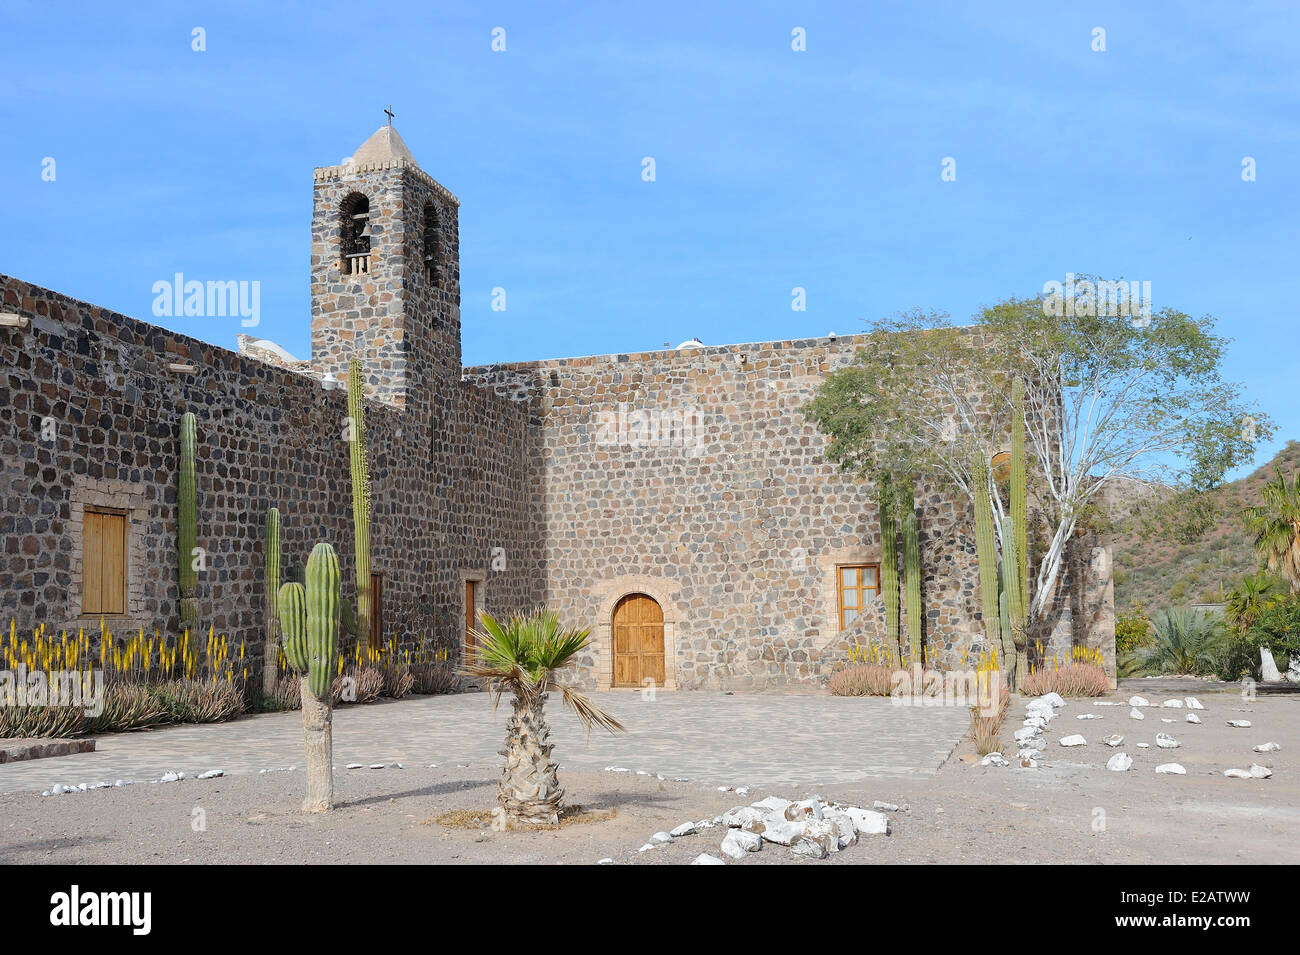 Mexico, Baja California Sur State, Mulege, Mission Santa Rosalia built between 1705 and 1766 - Stock Image